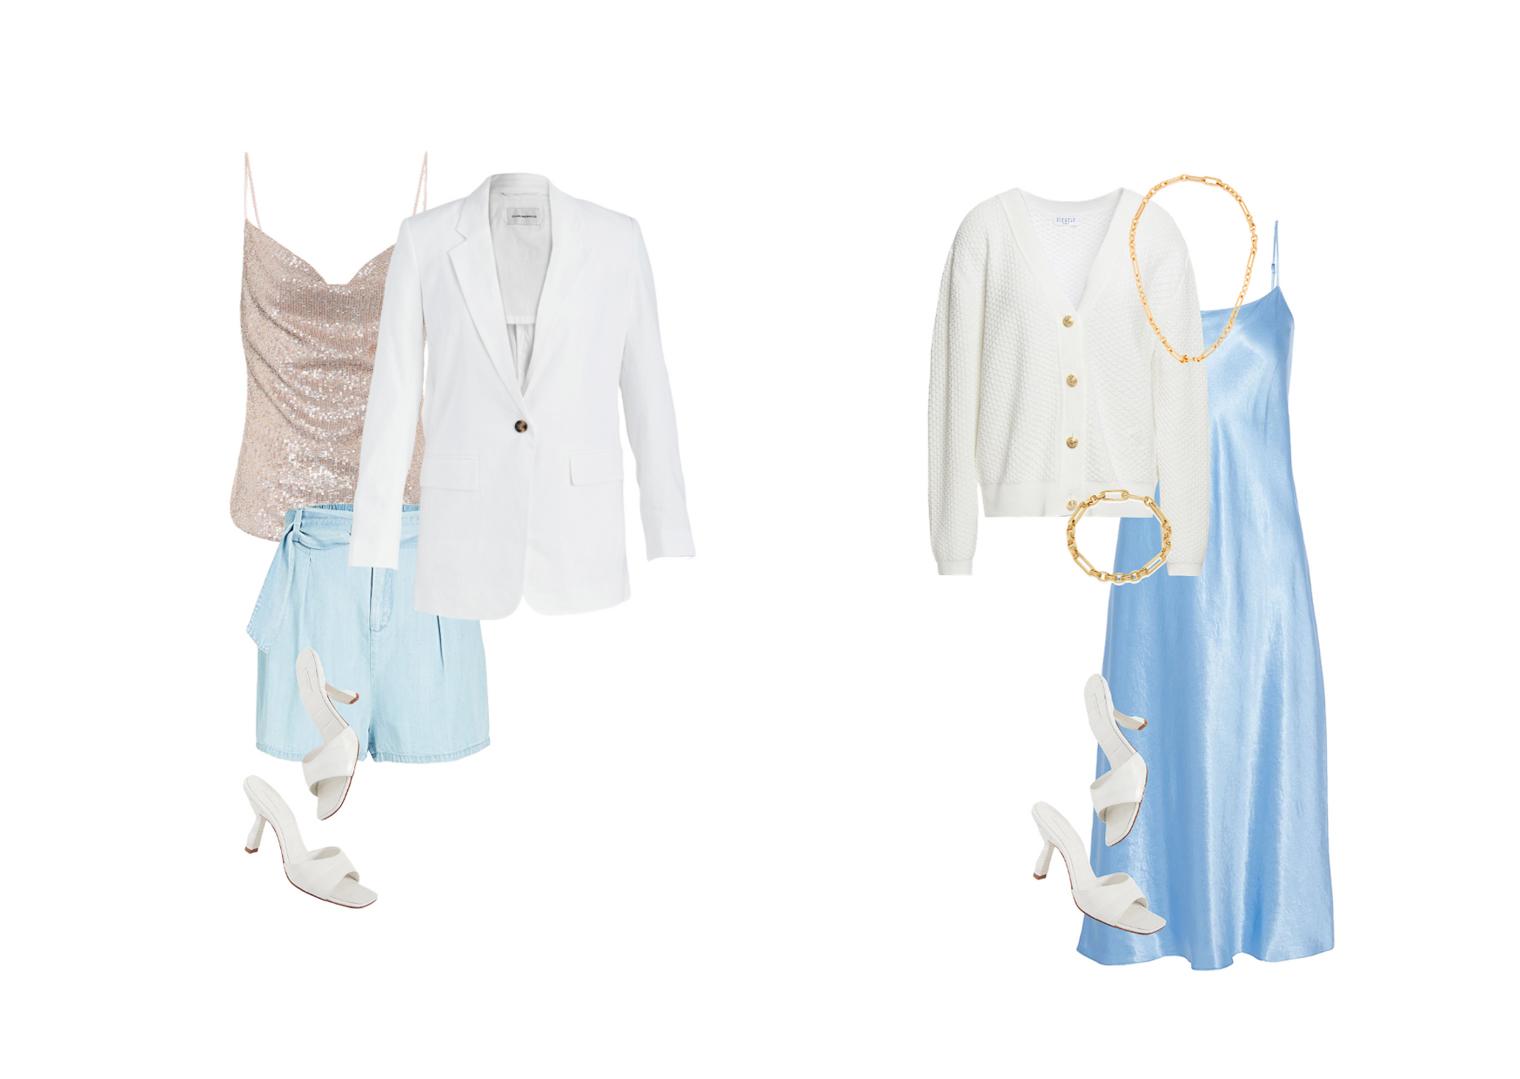 Summer wardrobe looks 2020 with slip dress